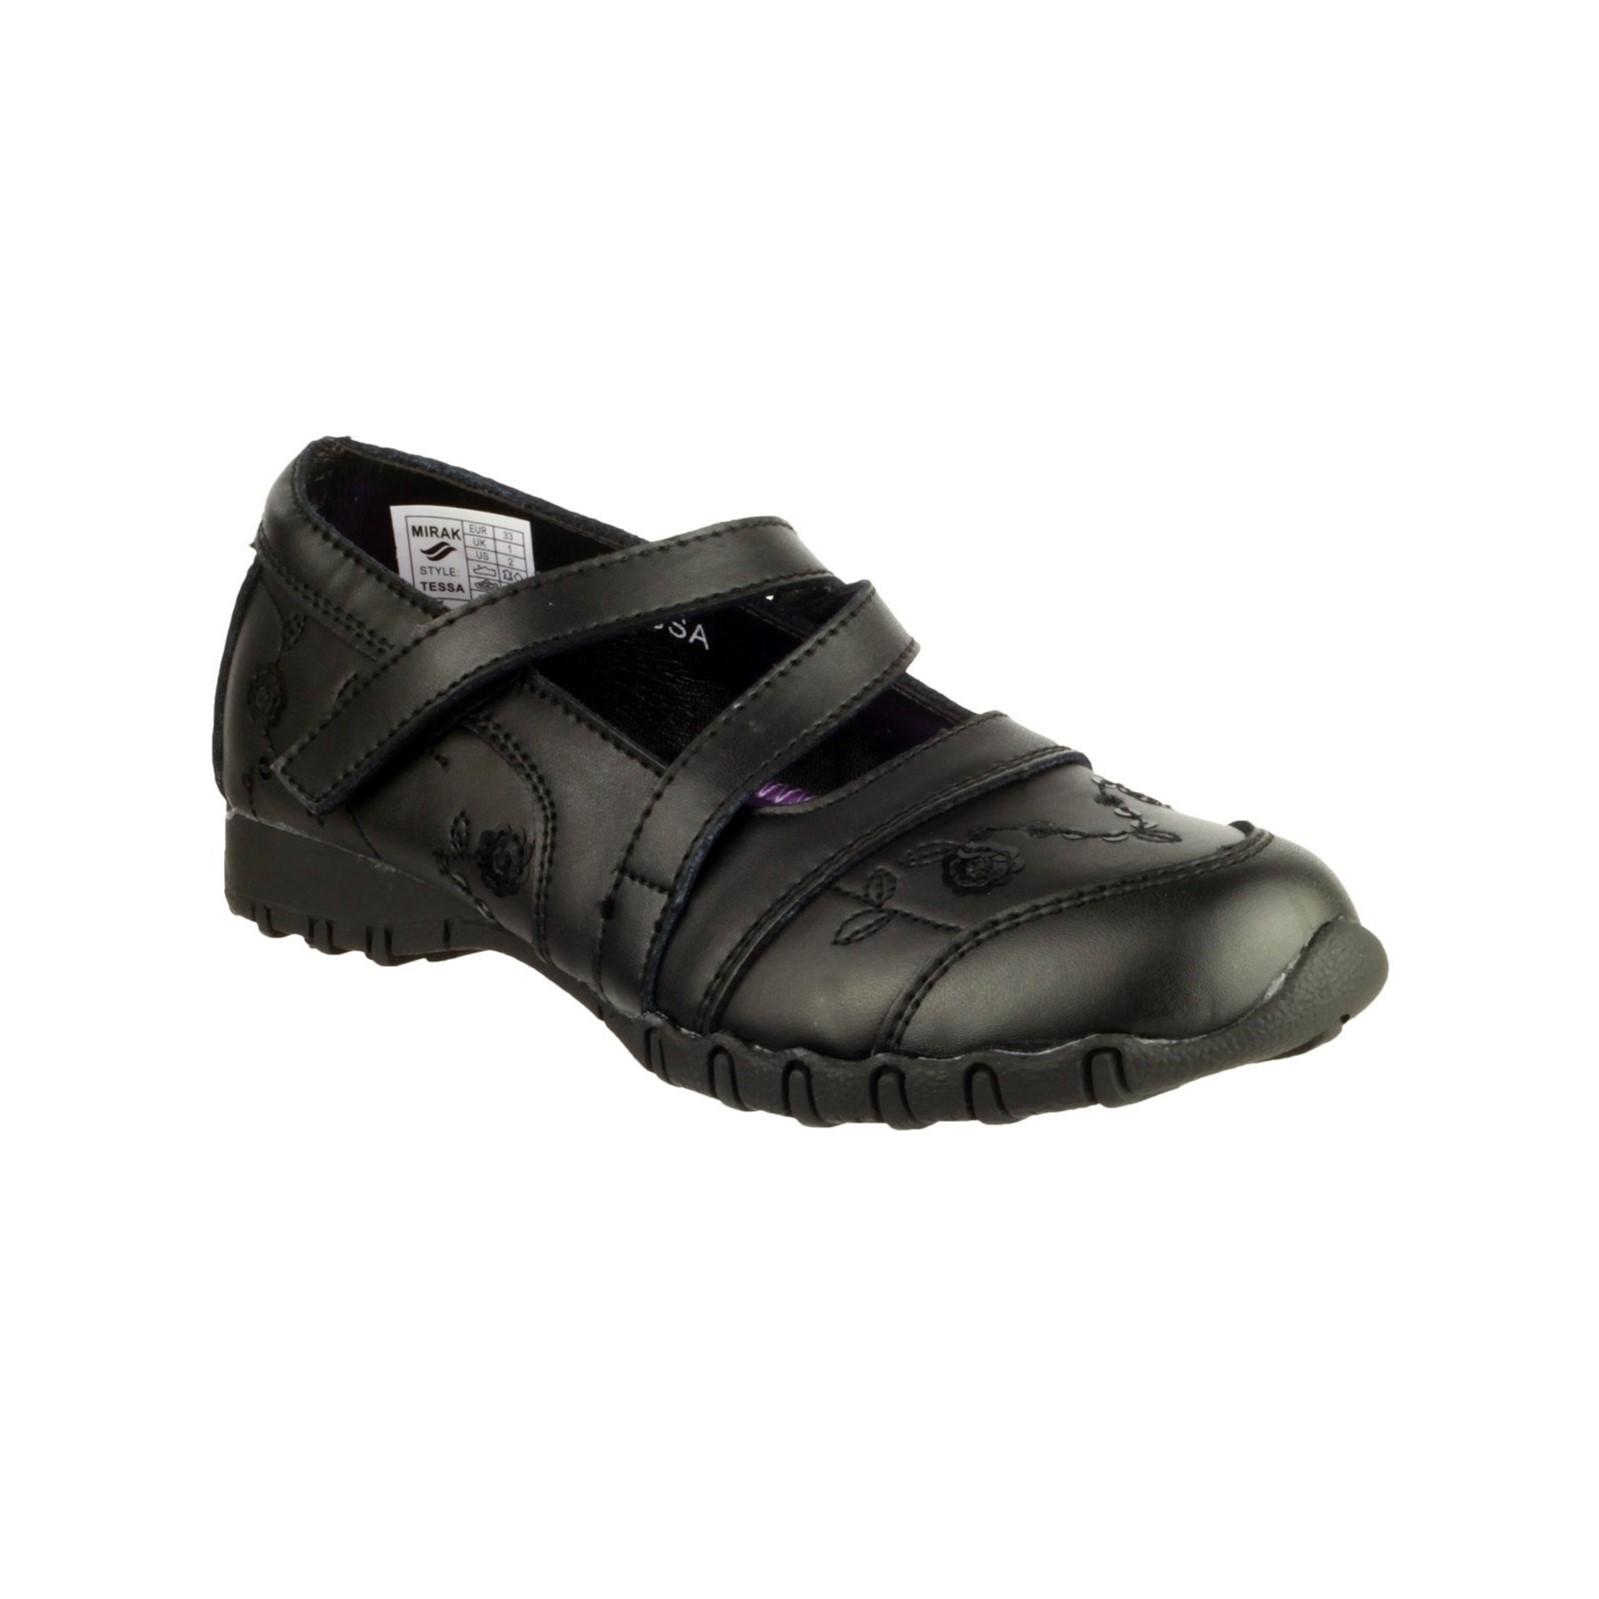 Mirak Tessa Shoe Girls School Shoes